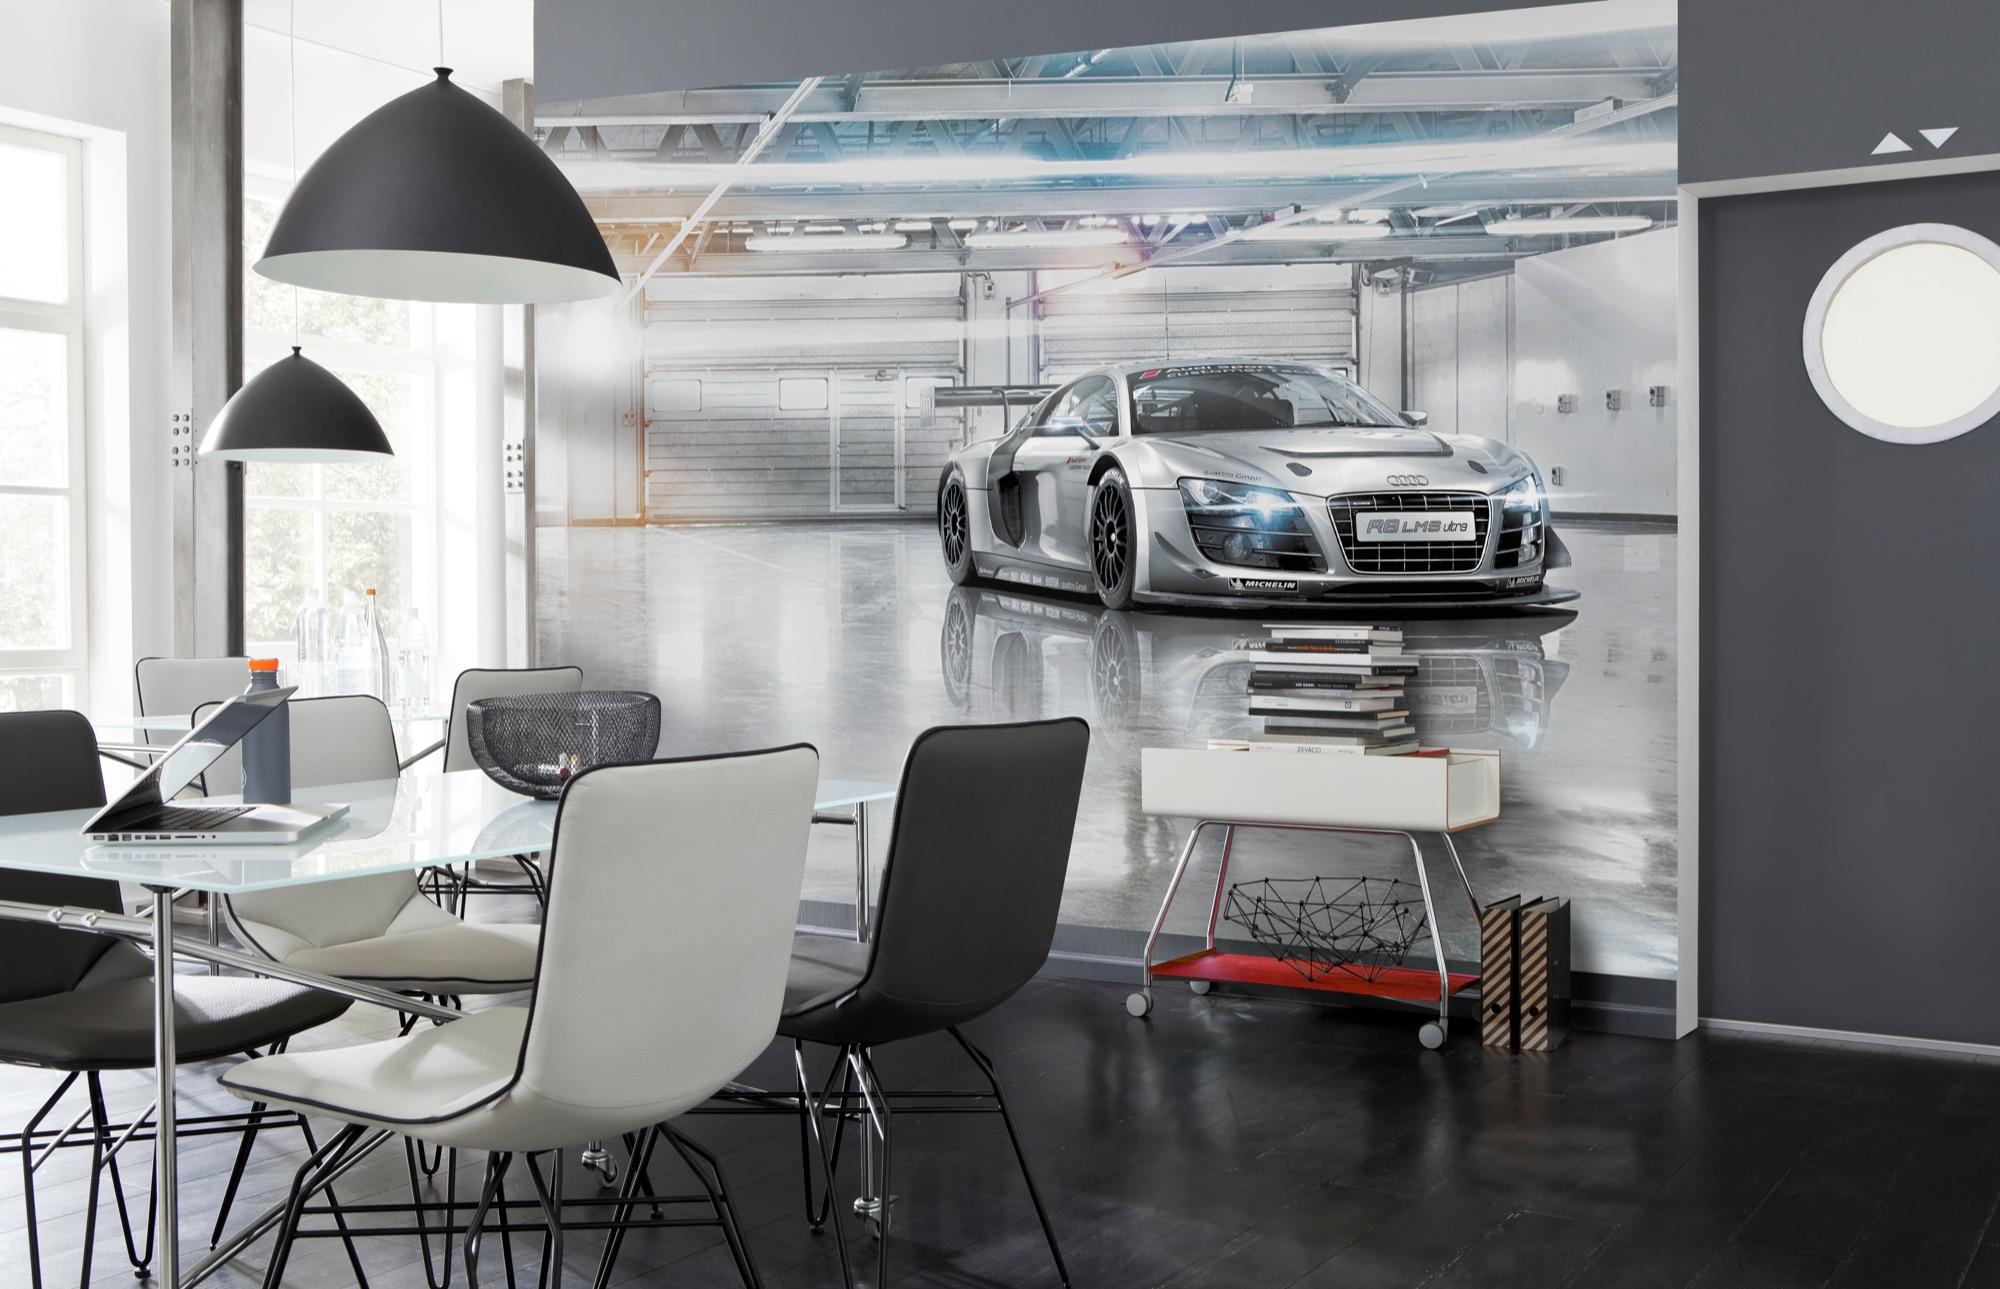 8-957_Audi_R8_LeMans_Interieur_i.jpg